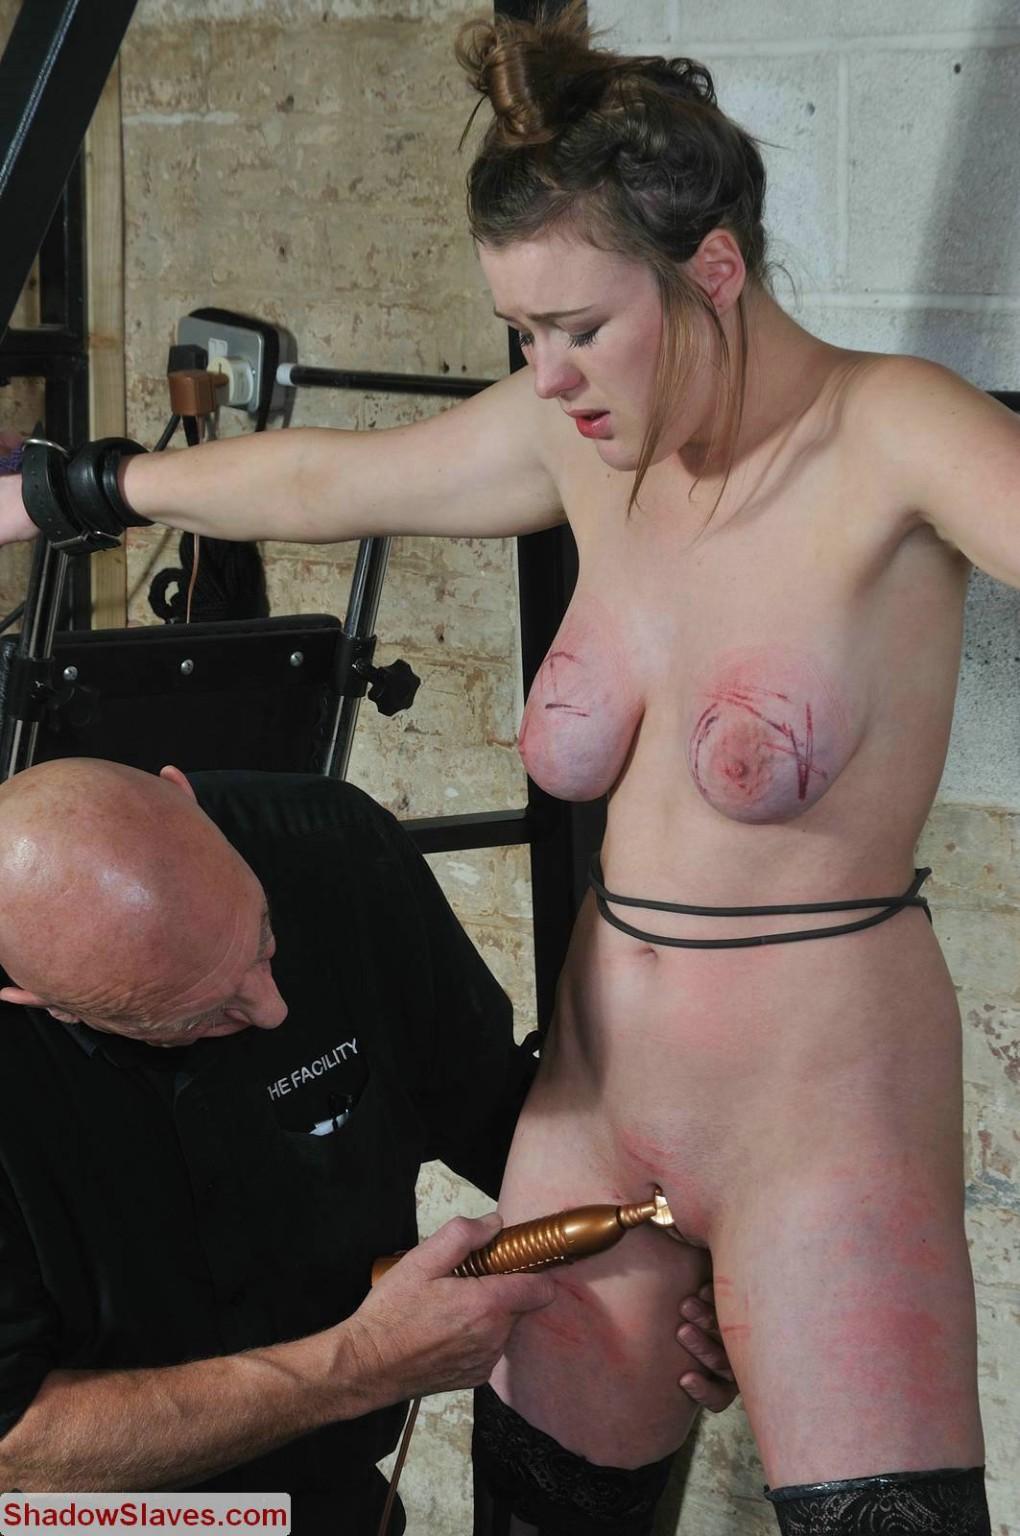 Hitachi Wand Torture